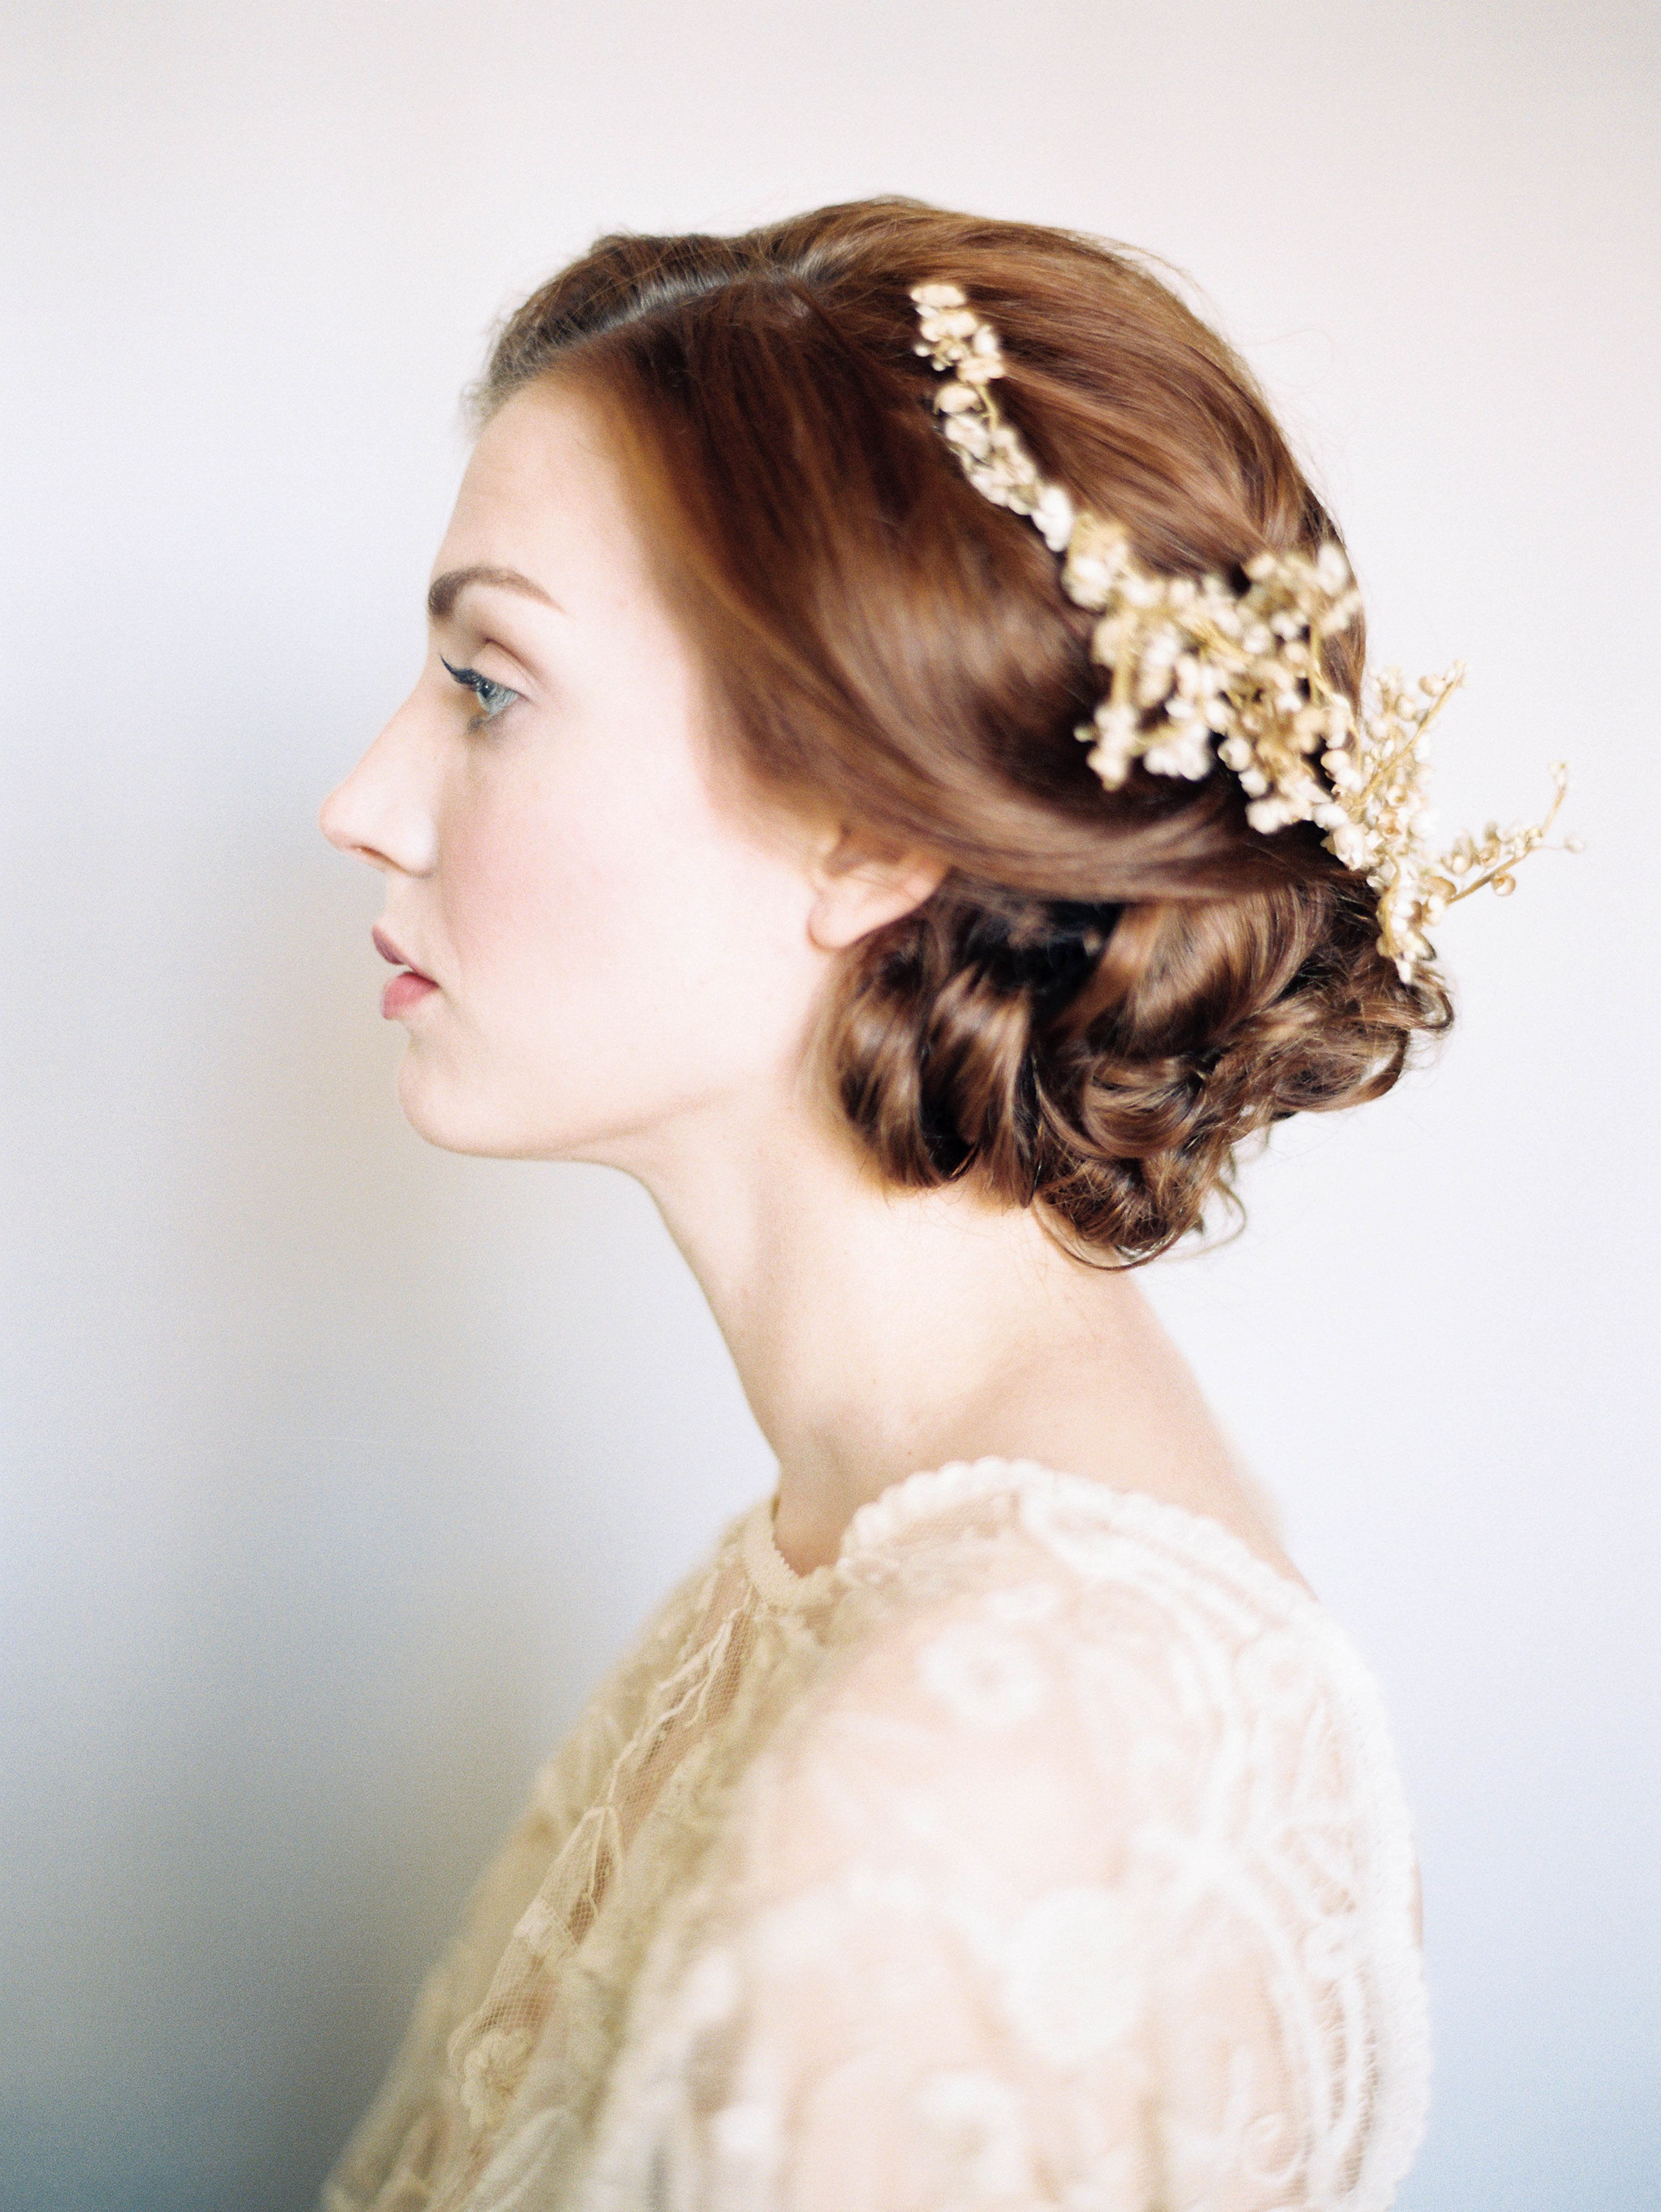 Gold Bridal Headpiece | photography by http://www.michaelandcarina.com/